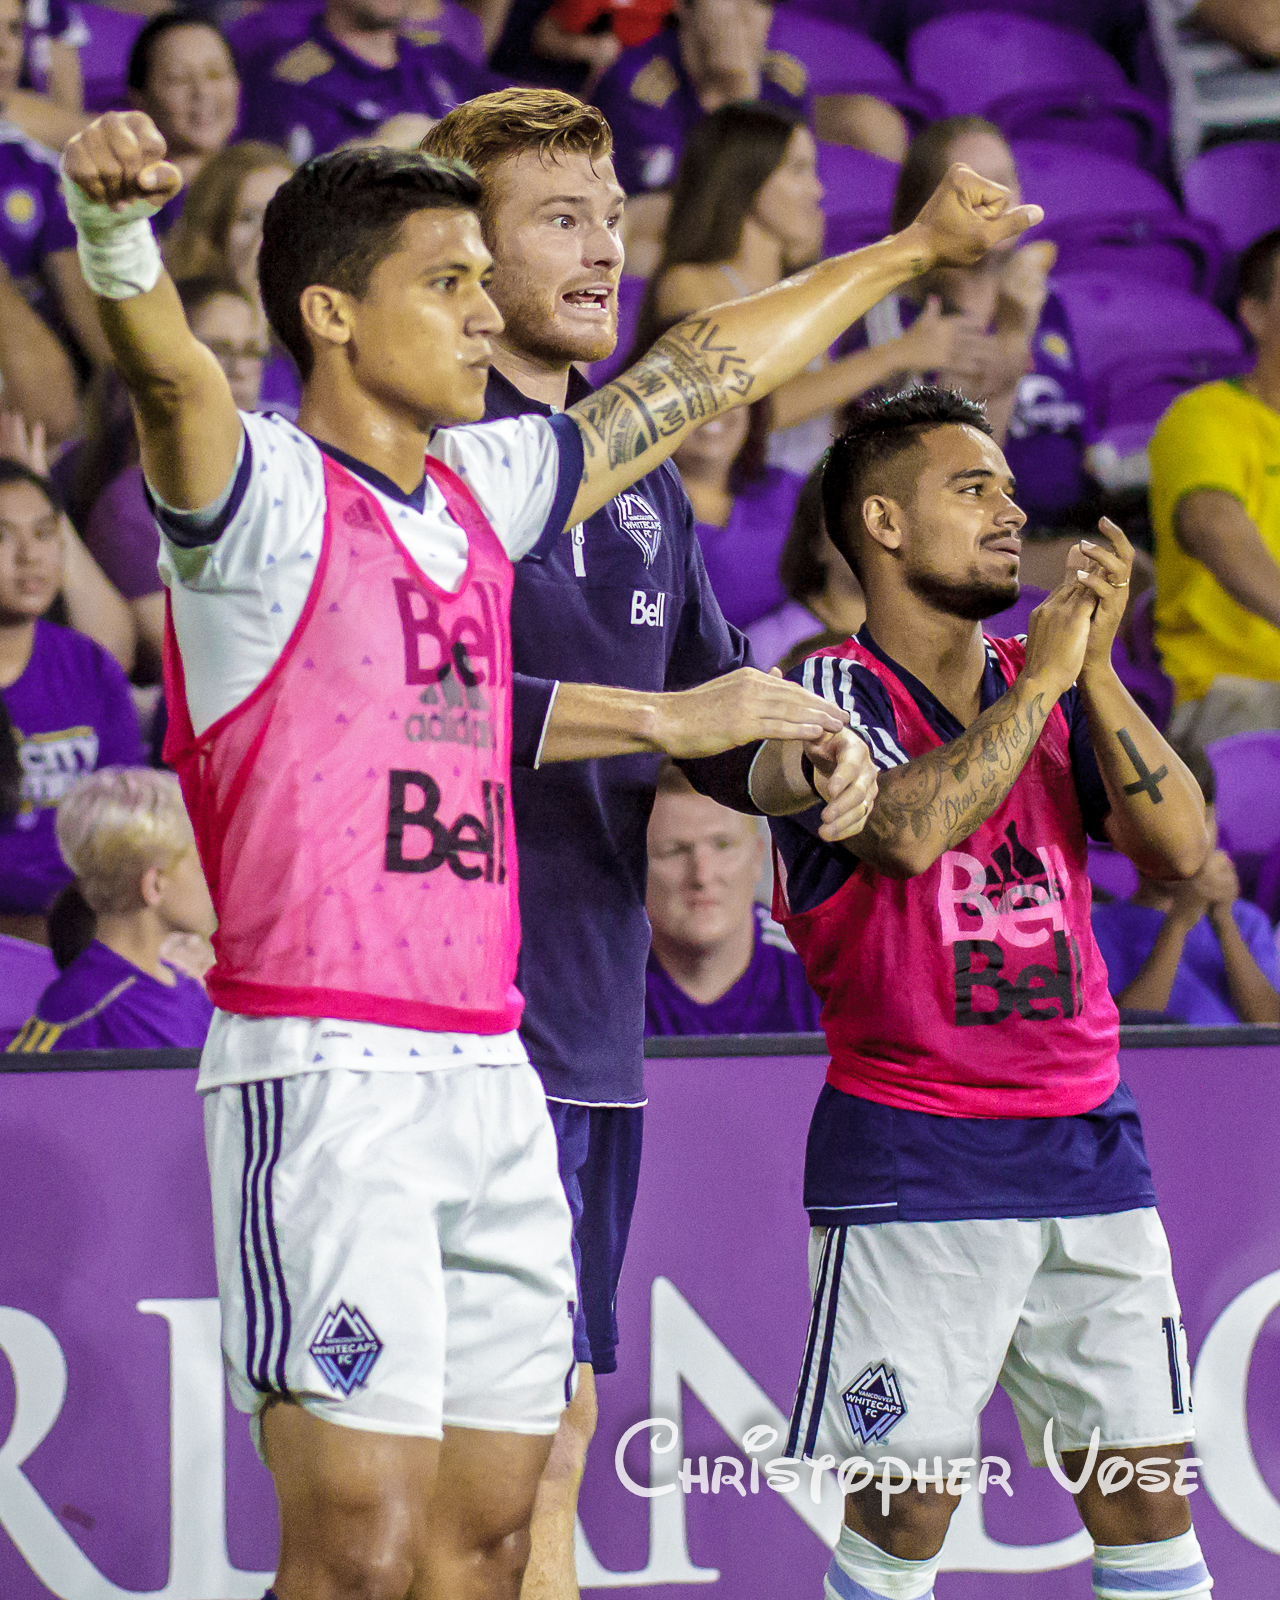 2017-08-26 Fredy Montero, Jon Poli, and Cristian Techera Goal Reaction (Brek Shea).jpg